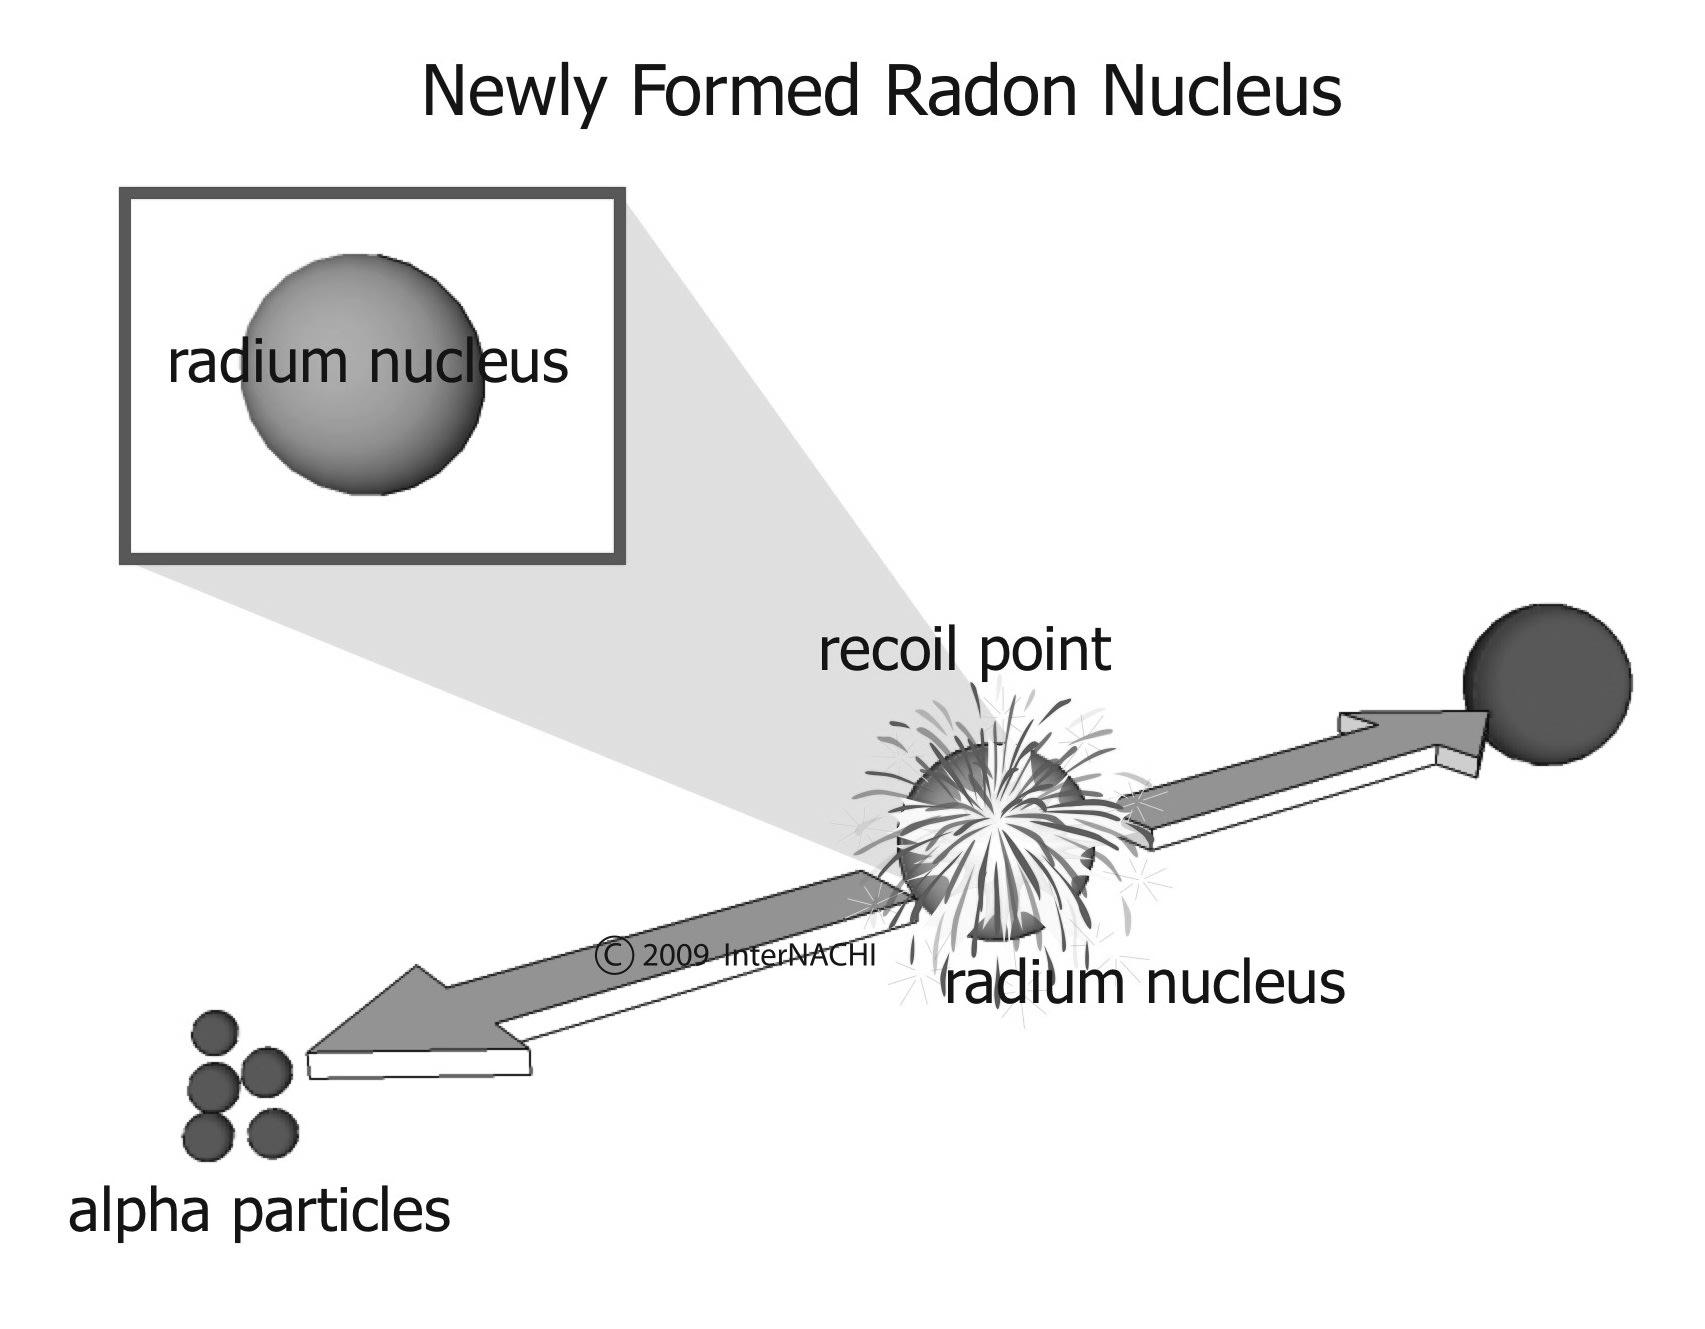 Newly formed radon nucleus.